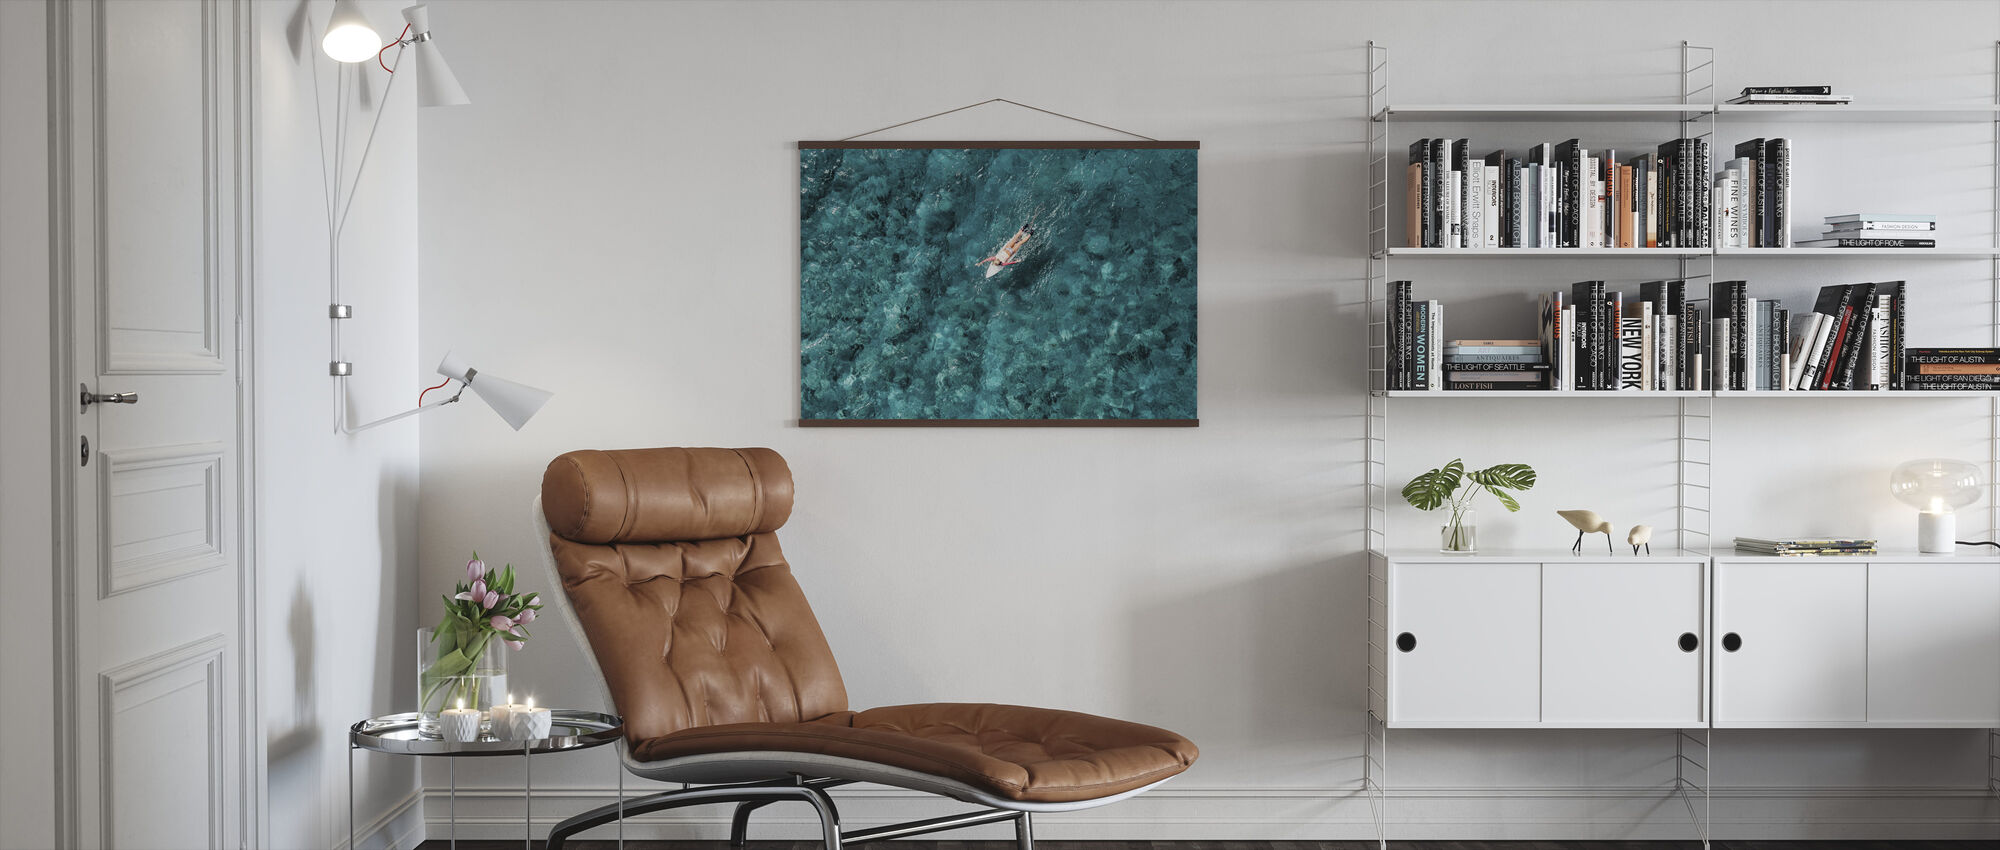 Surf peddelen in de zee - Poster - Woonkamer